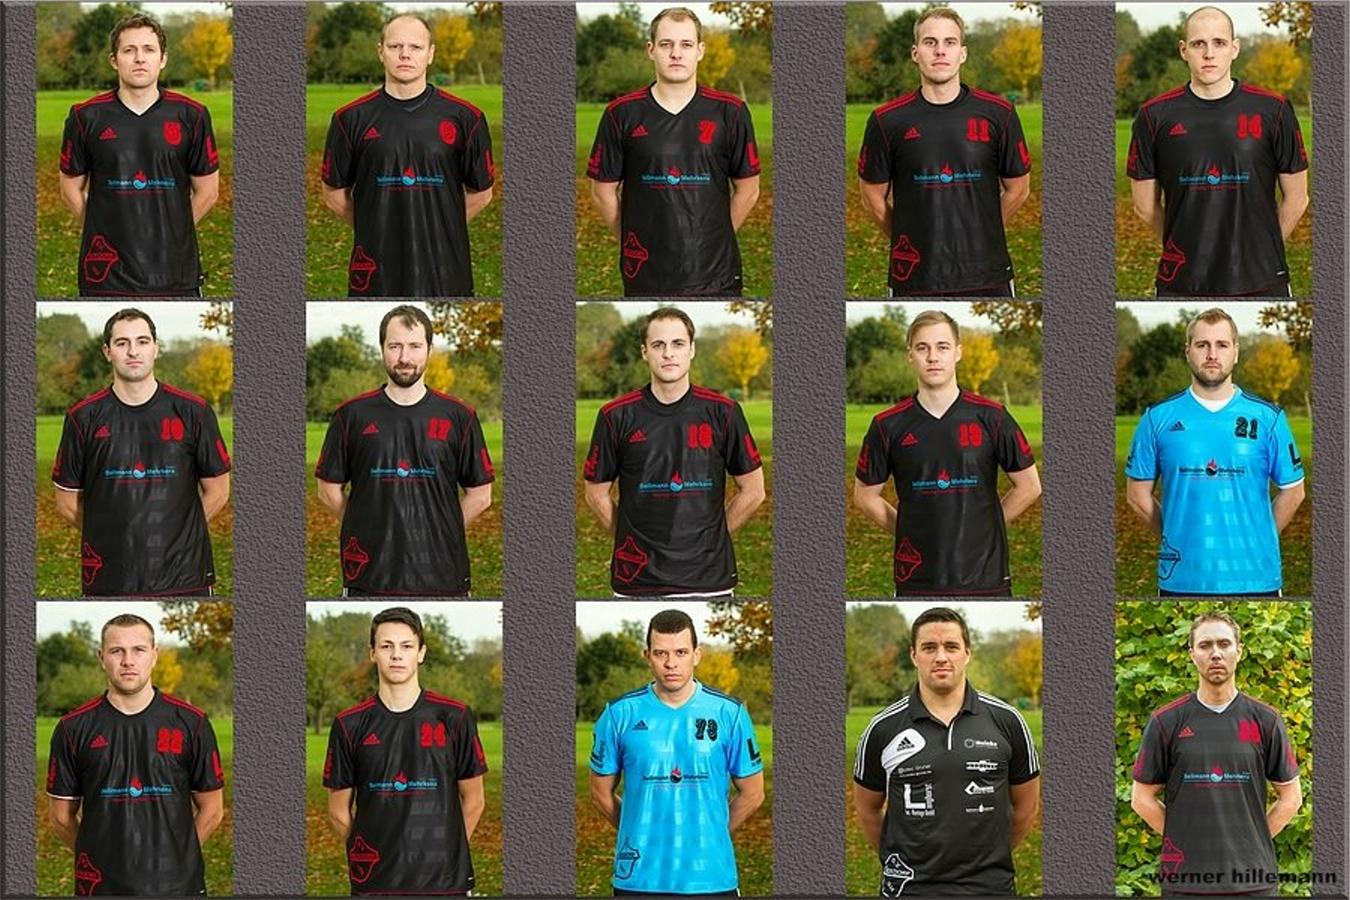 Handball Herren 2 2013 01